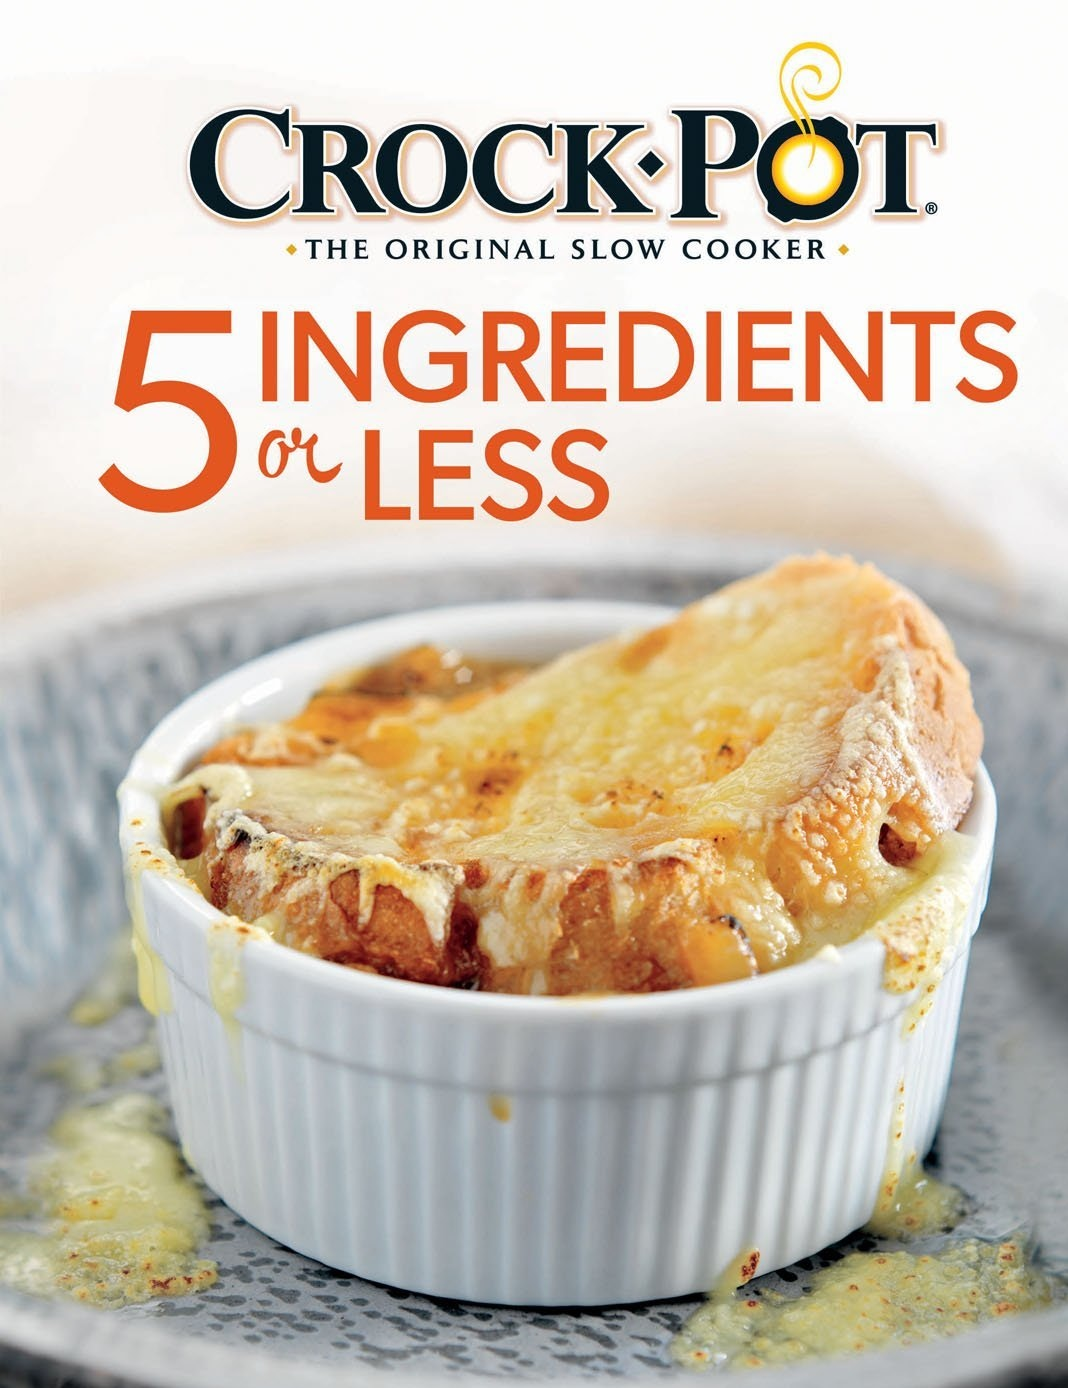 Crock-Pot 5 Ingredients Or Less